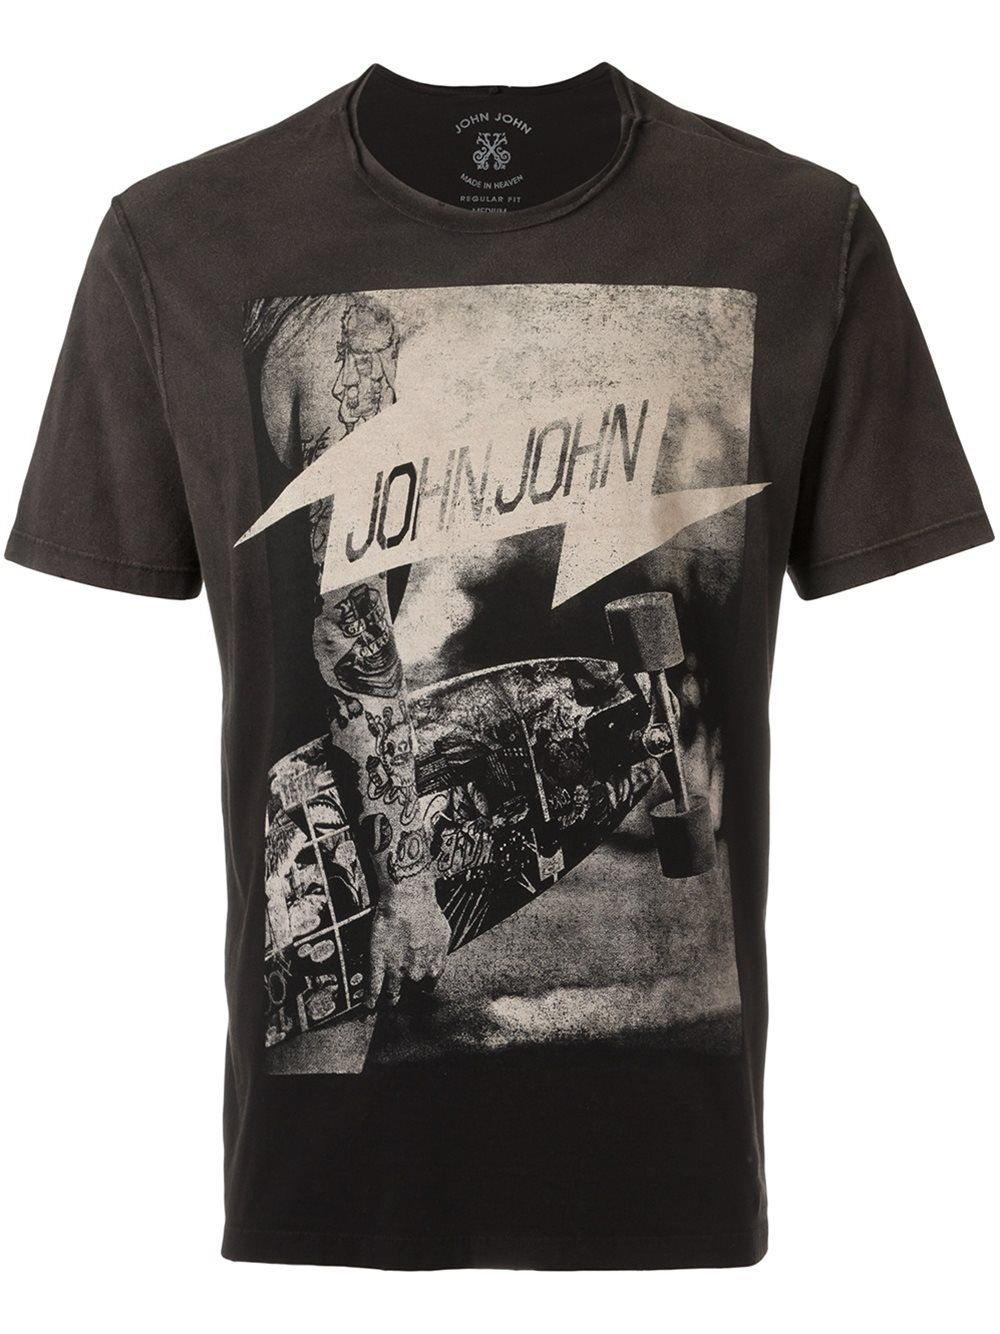 John John Camiseta Com Estampa 02 T Shirts Tops Pinterest